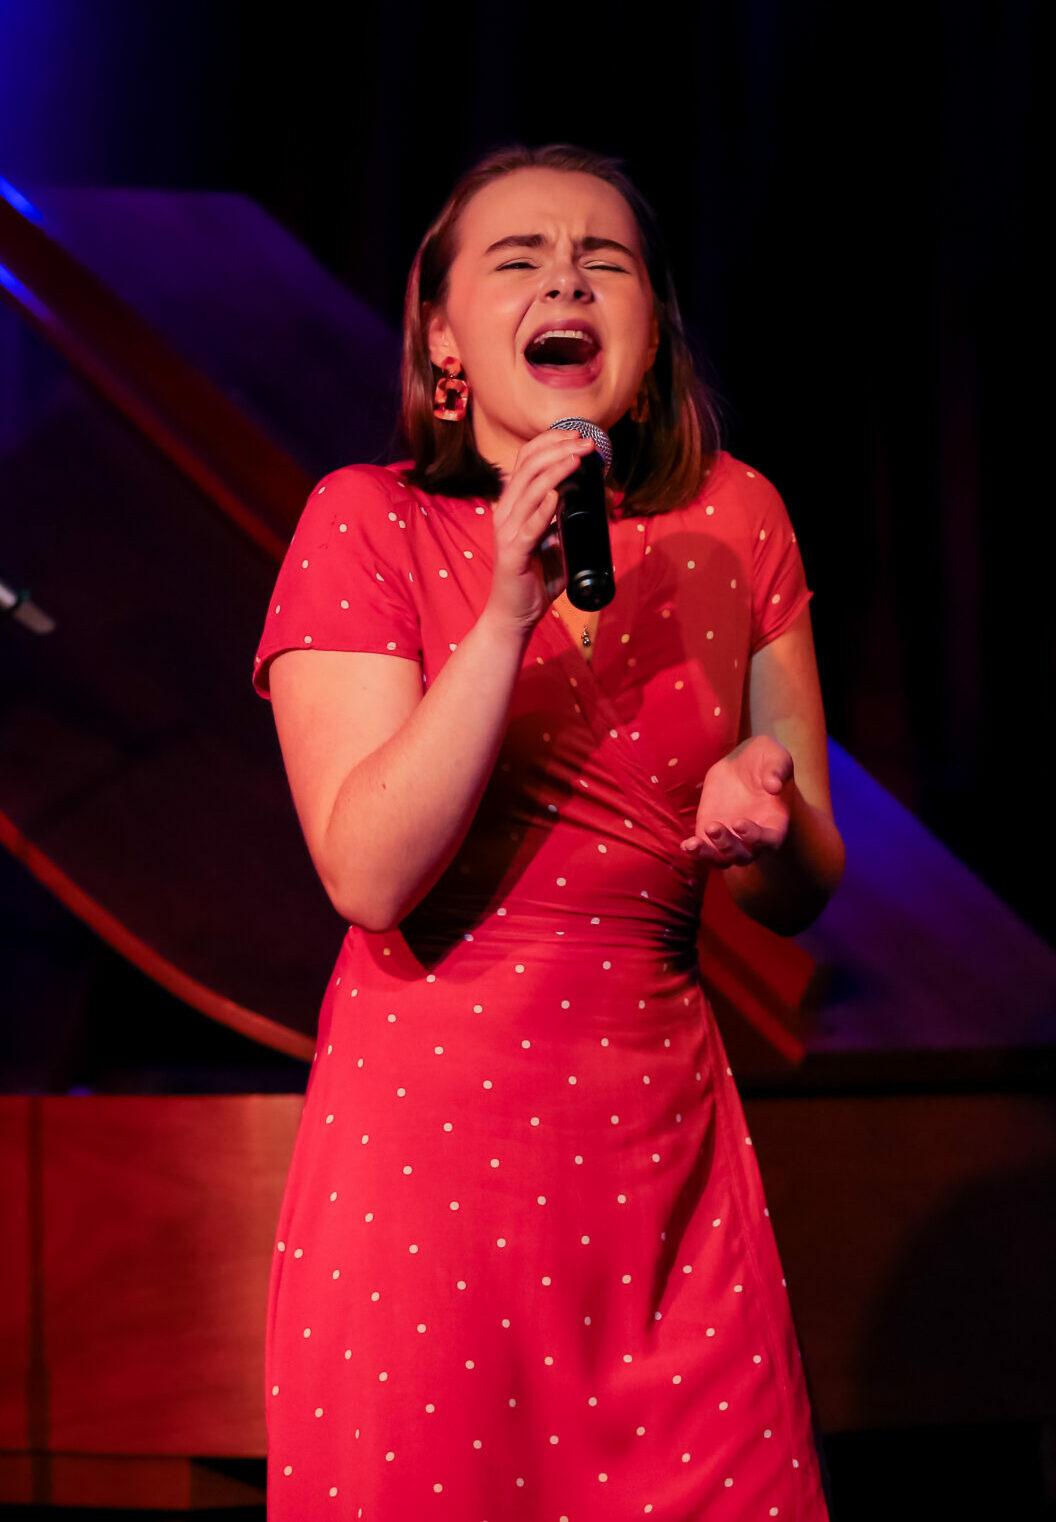 Ruby Rakos Performing